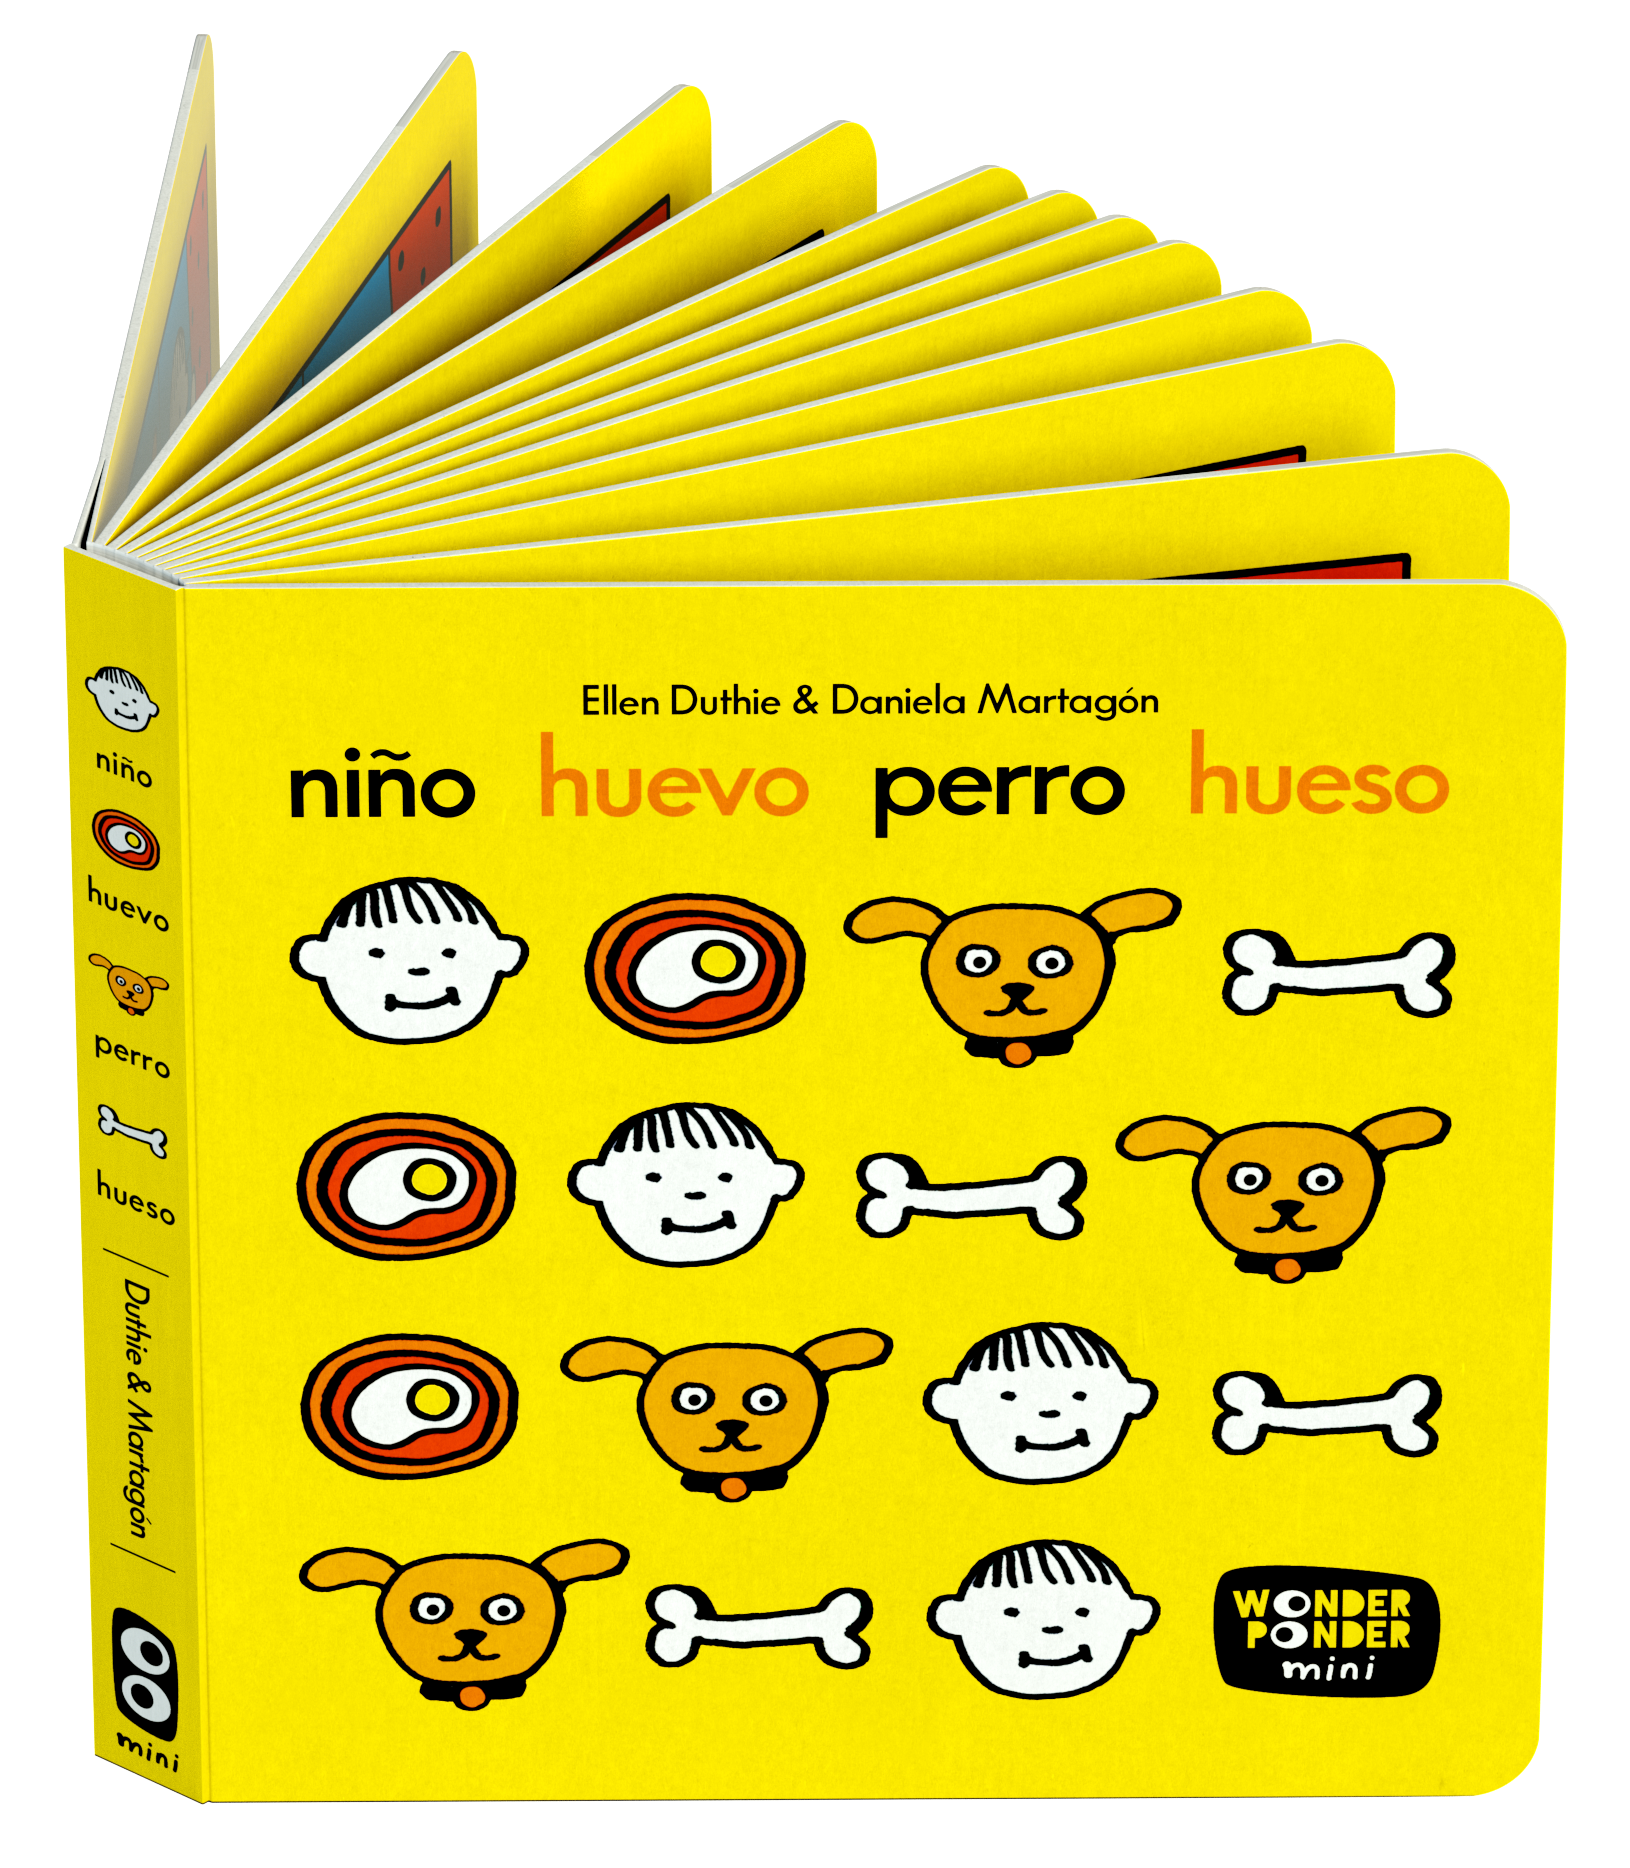 NHPH_Esp_Abanico_Libro (1).png